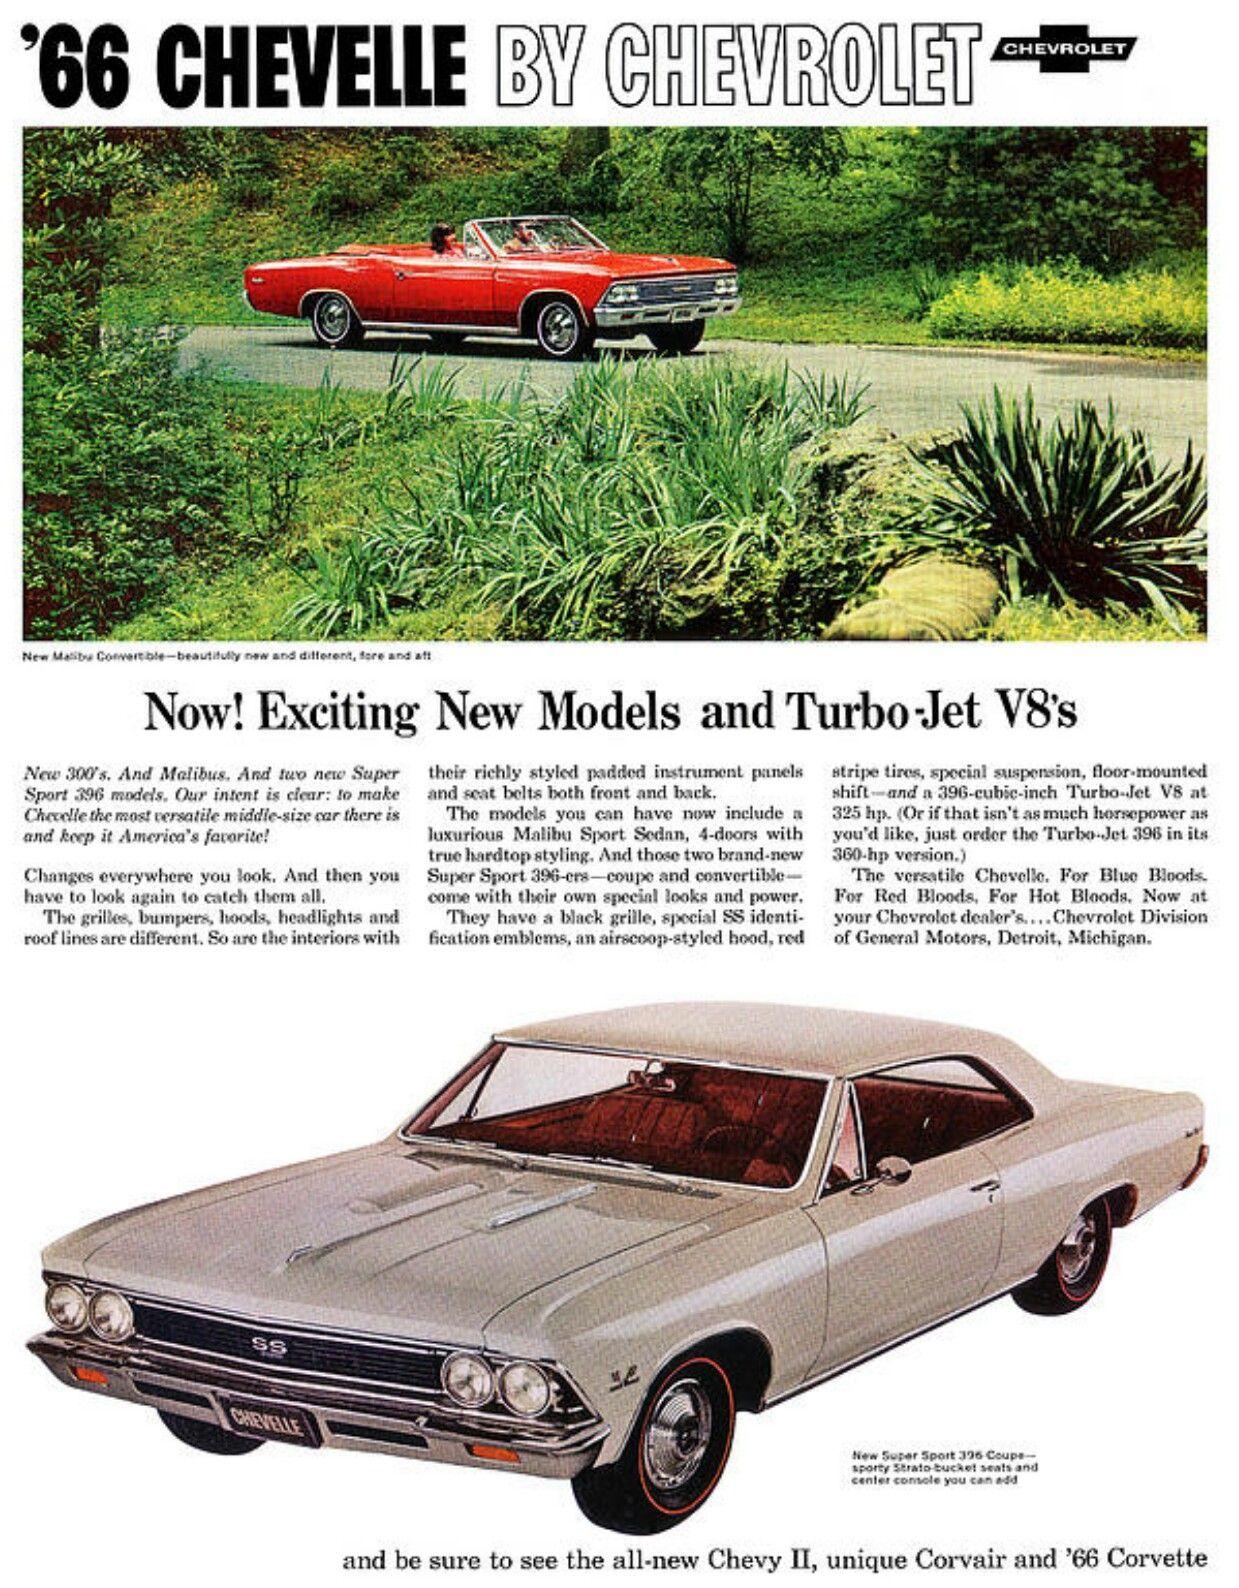 66 Chevy Chevelle Turbo -Jet V8 | Cars | Pinterest | Chevy chevelle ...